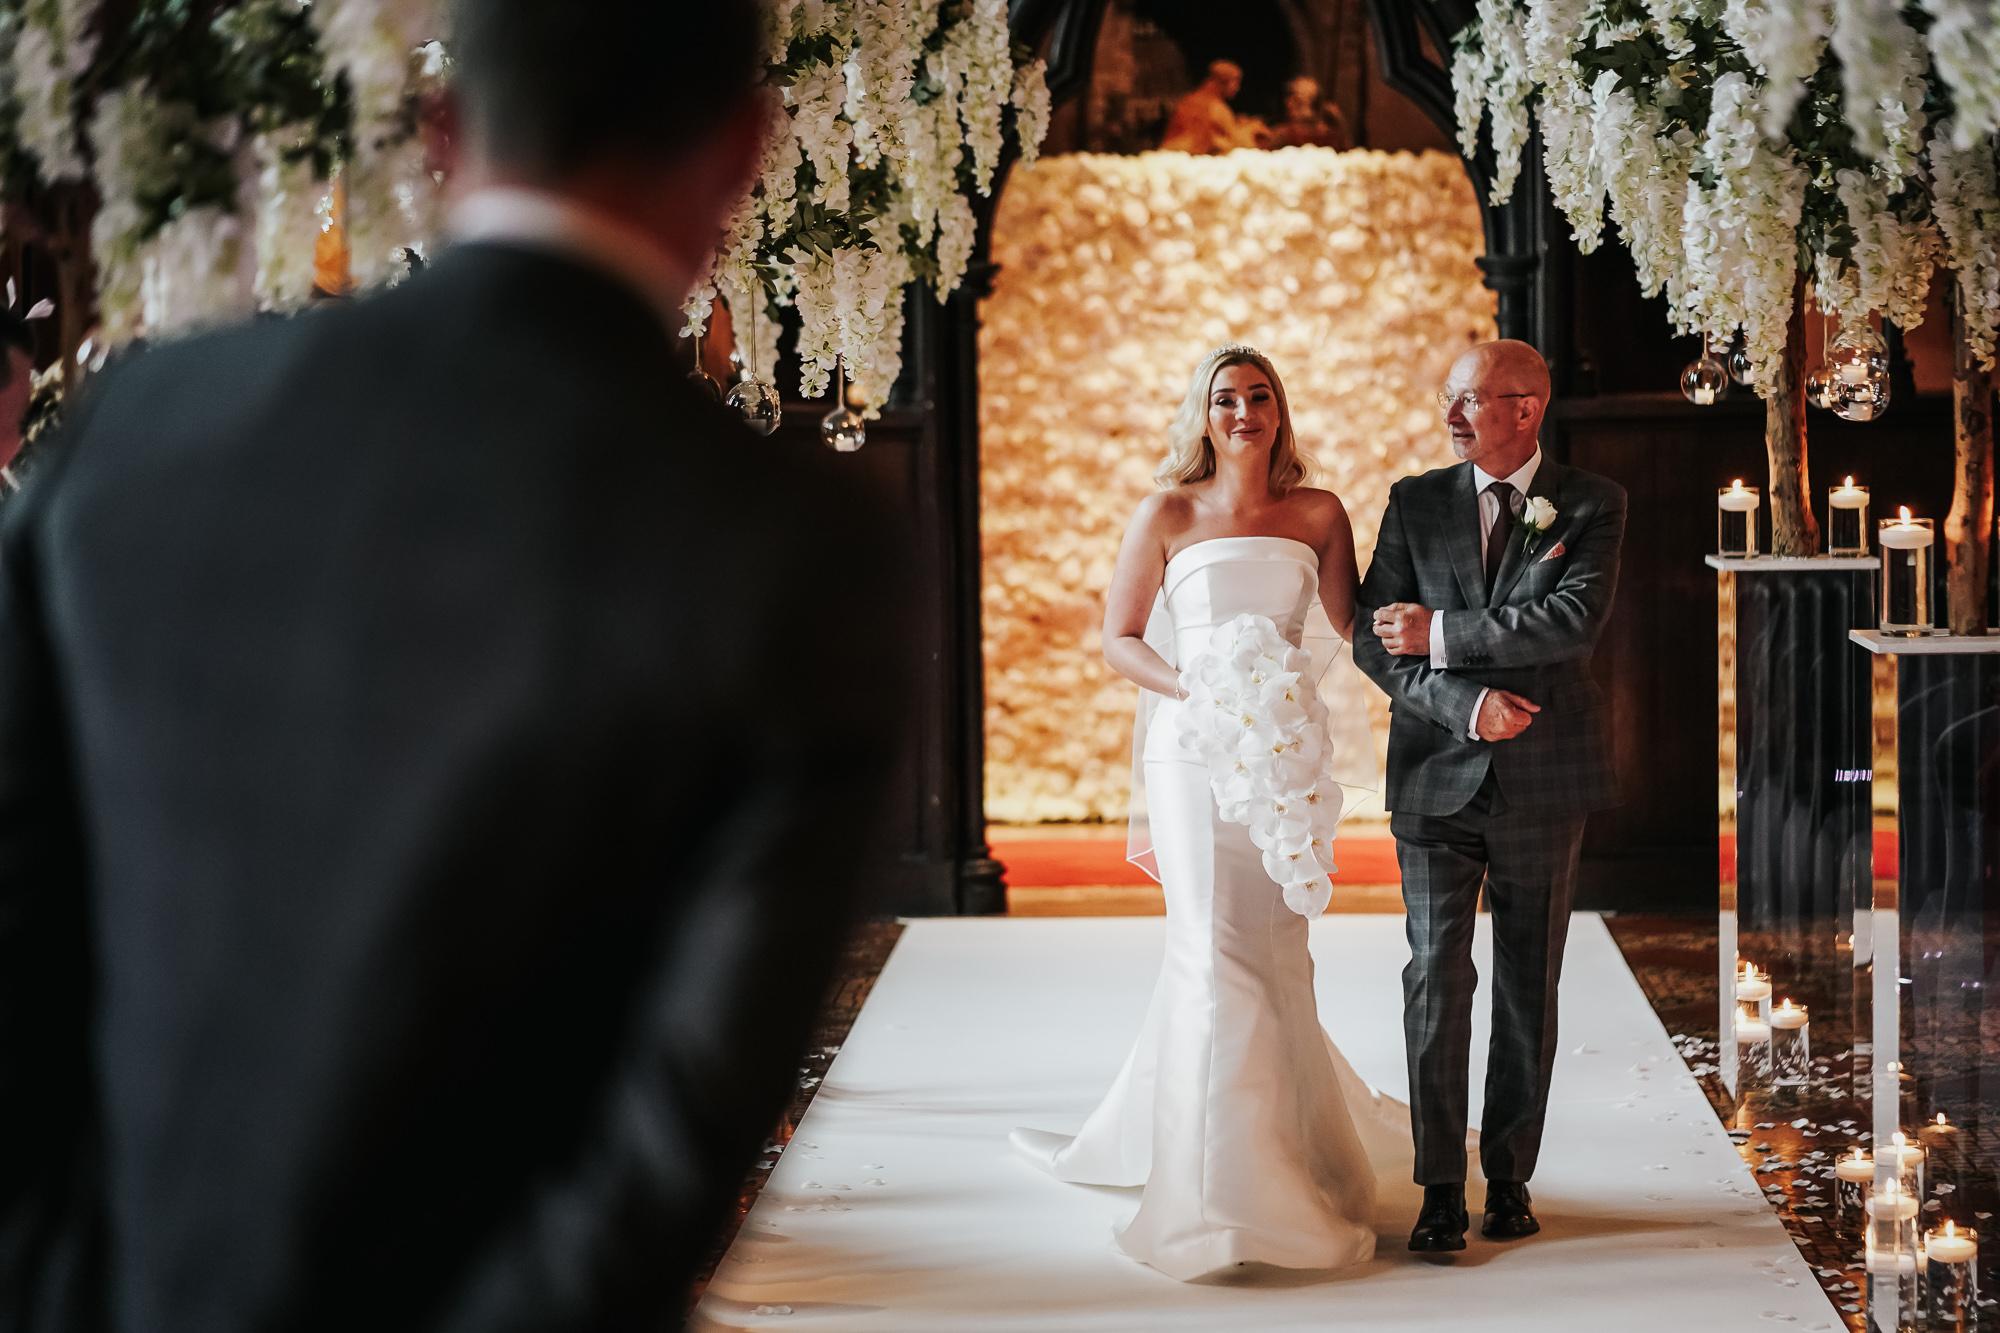 Peckforton Castle wedding photography cheshire wedding photographer (21 of 57).jpg